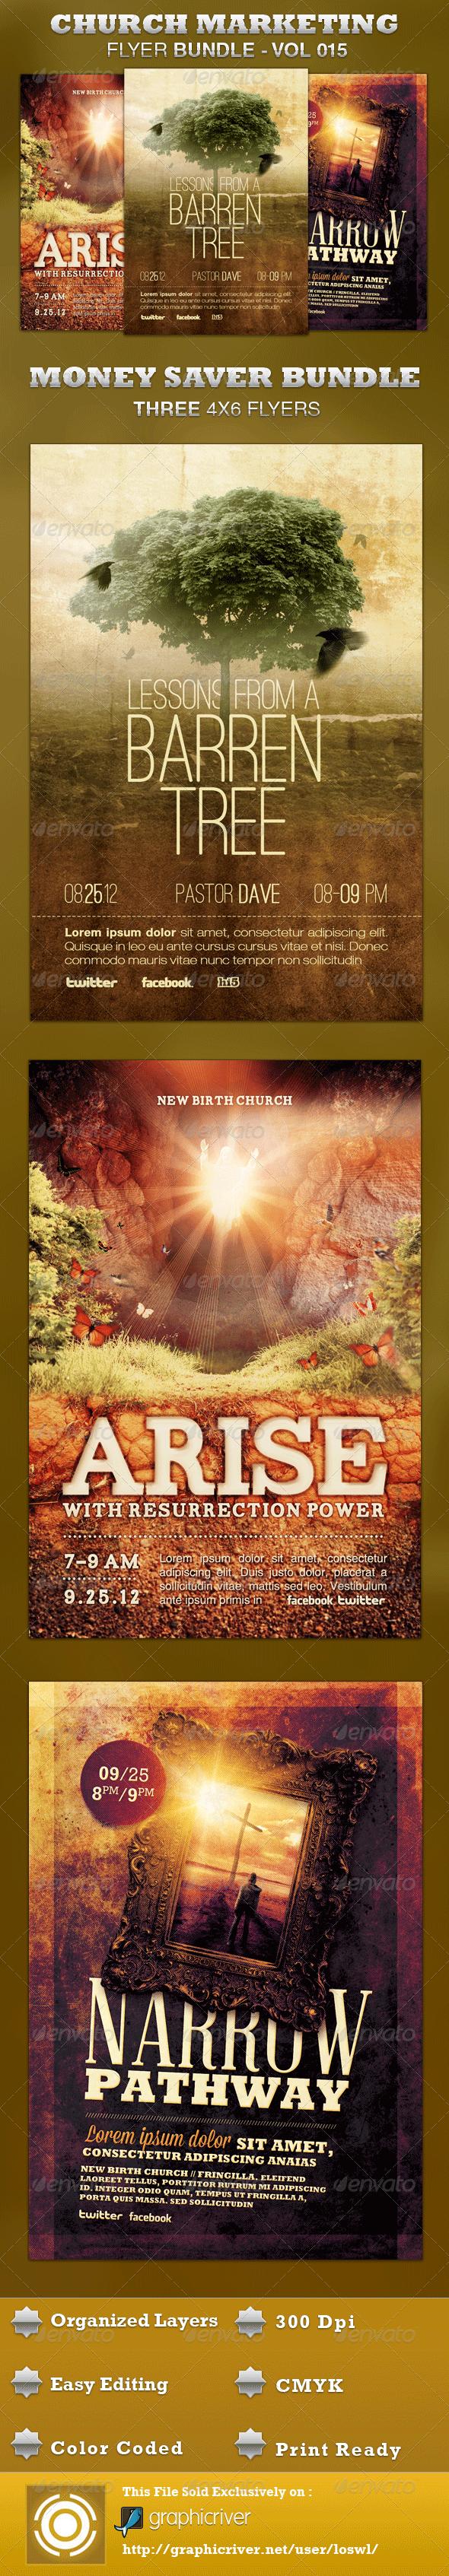 GraphicRiver Church Marketing Flyer Bundle-Vol 015 3544365